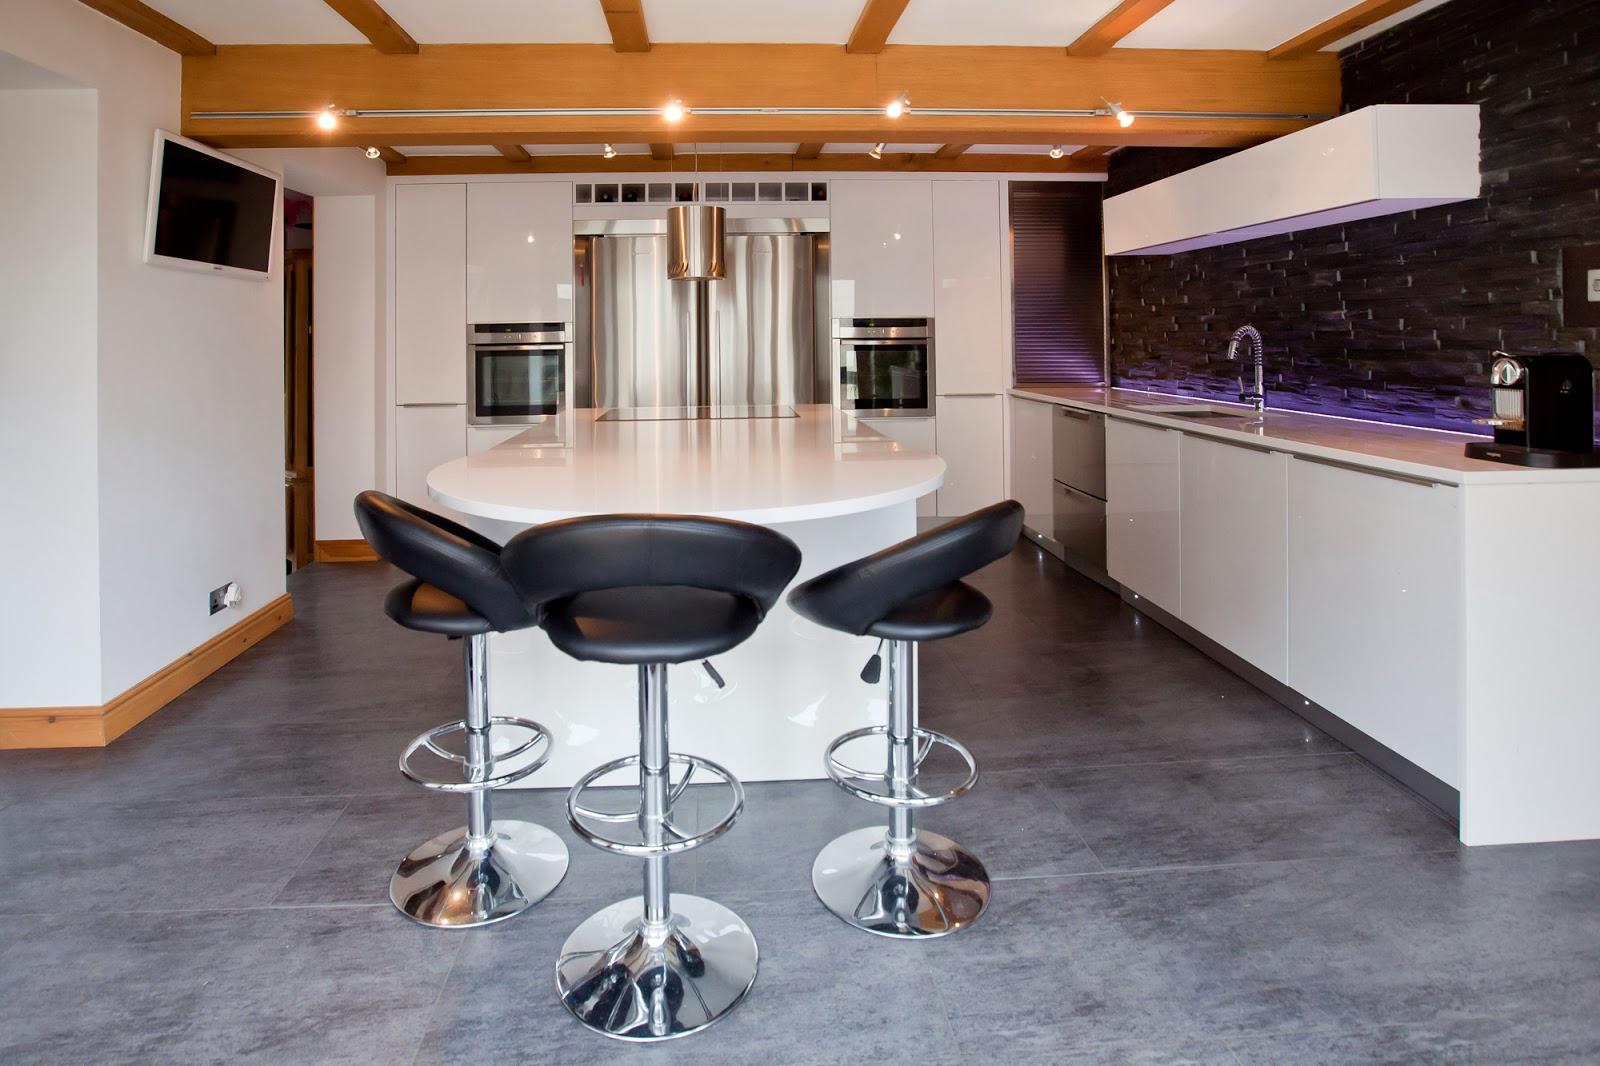 2014 Kitchen Ideas, Lisa Melvin Top Tips For Your Dream Kitchen High Gloss  White Kitchen